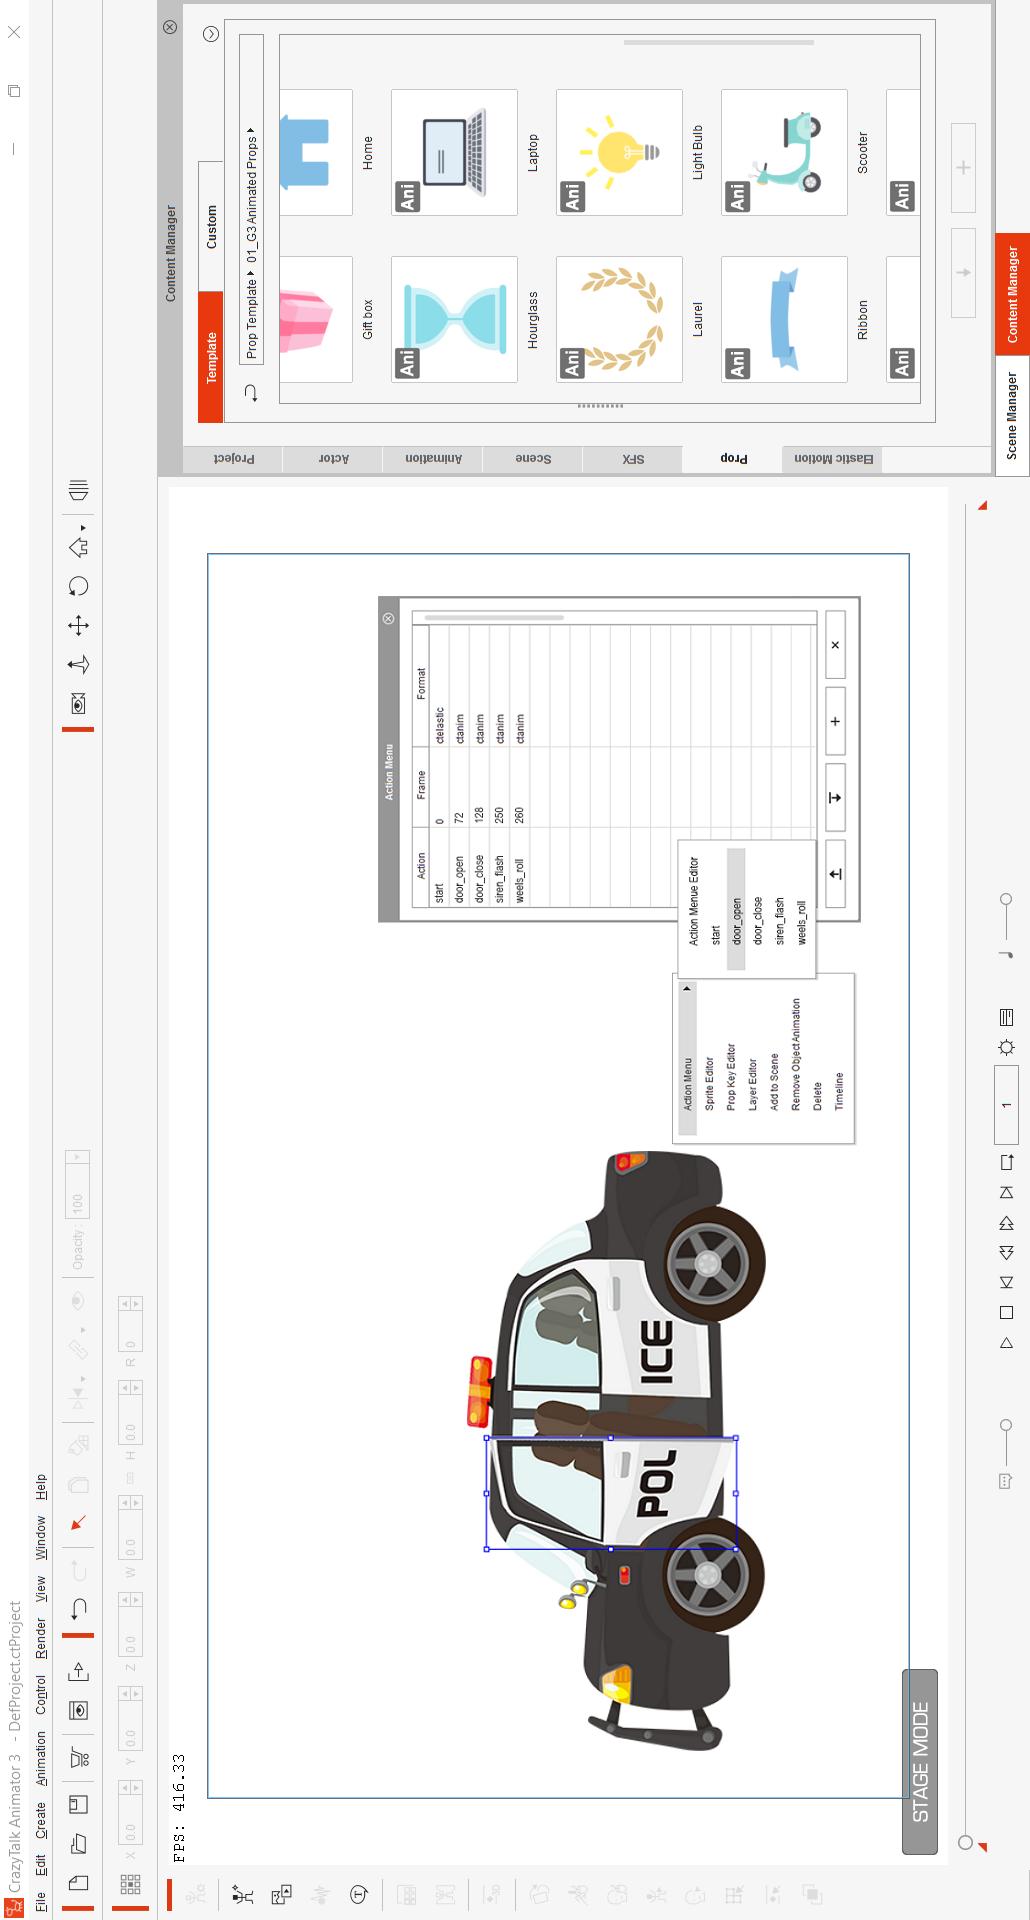 crazytalk-animator-4996_9_4996.png